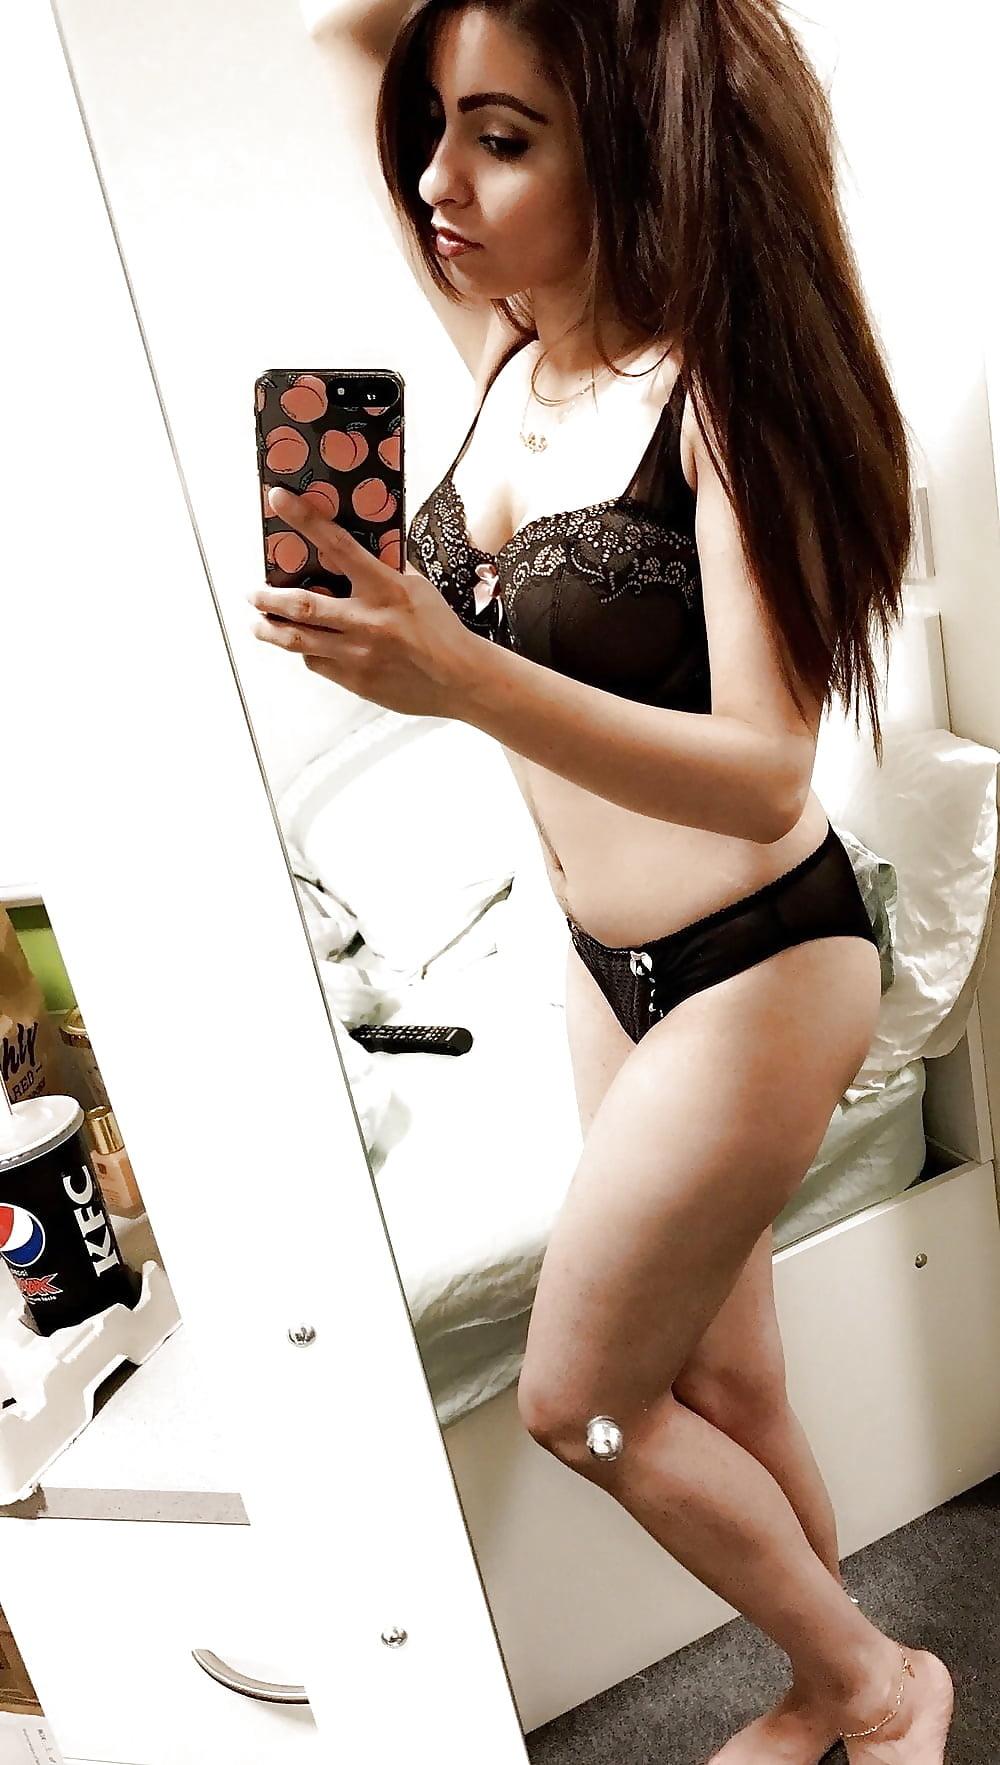 Sexy Paki Indian Teen Selfshot boobs Hot Girl 4 - Sexy Paki Indian Teen Selfshot boobs Hot Girl